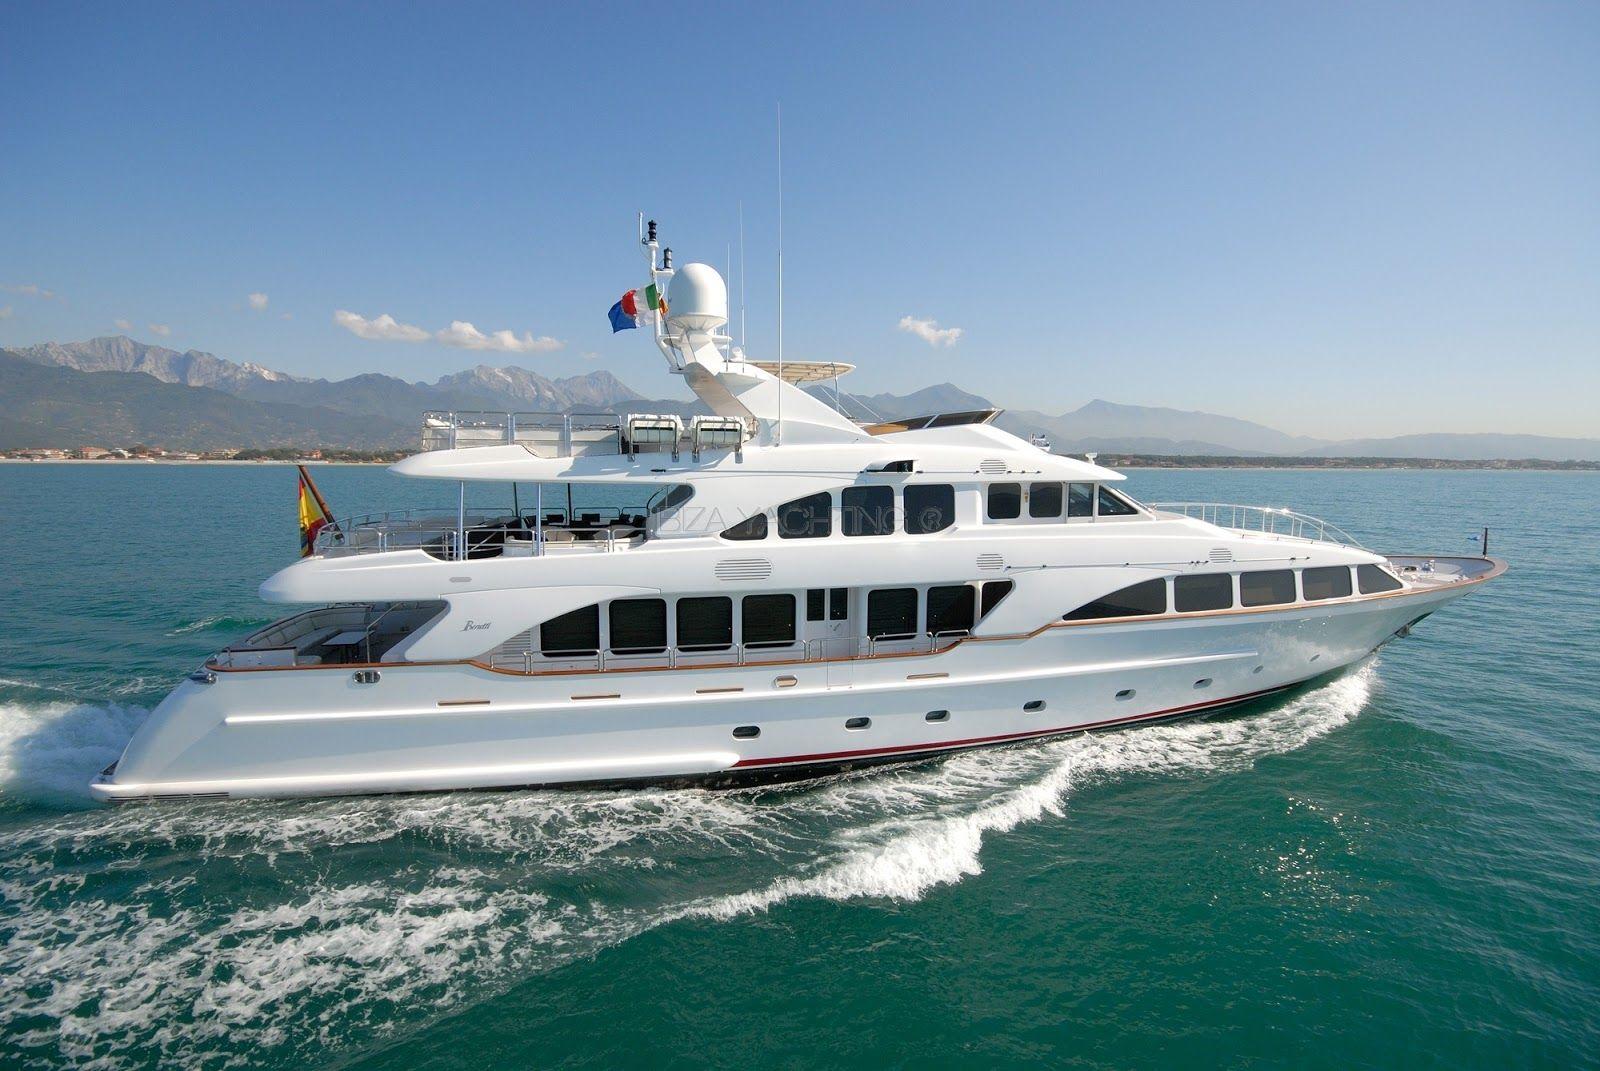 Alquiler barcos ibiza alquiler de yates en ibiza pinterest - Yates de lujo interior ...